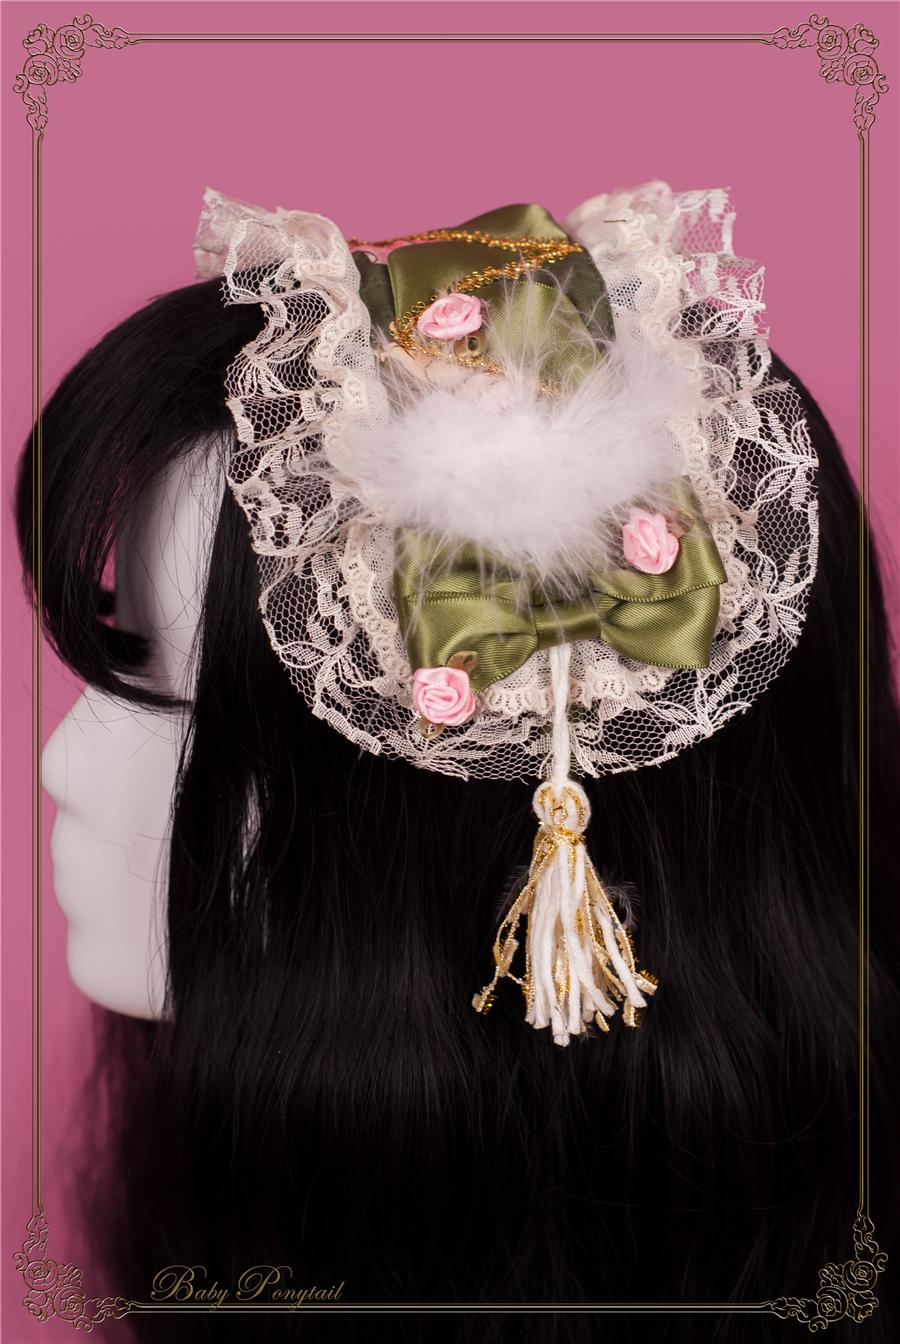 Babyponytail_Accessory_Tassel Head Dress_Green_03.jpg